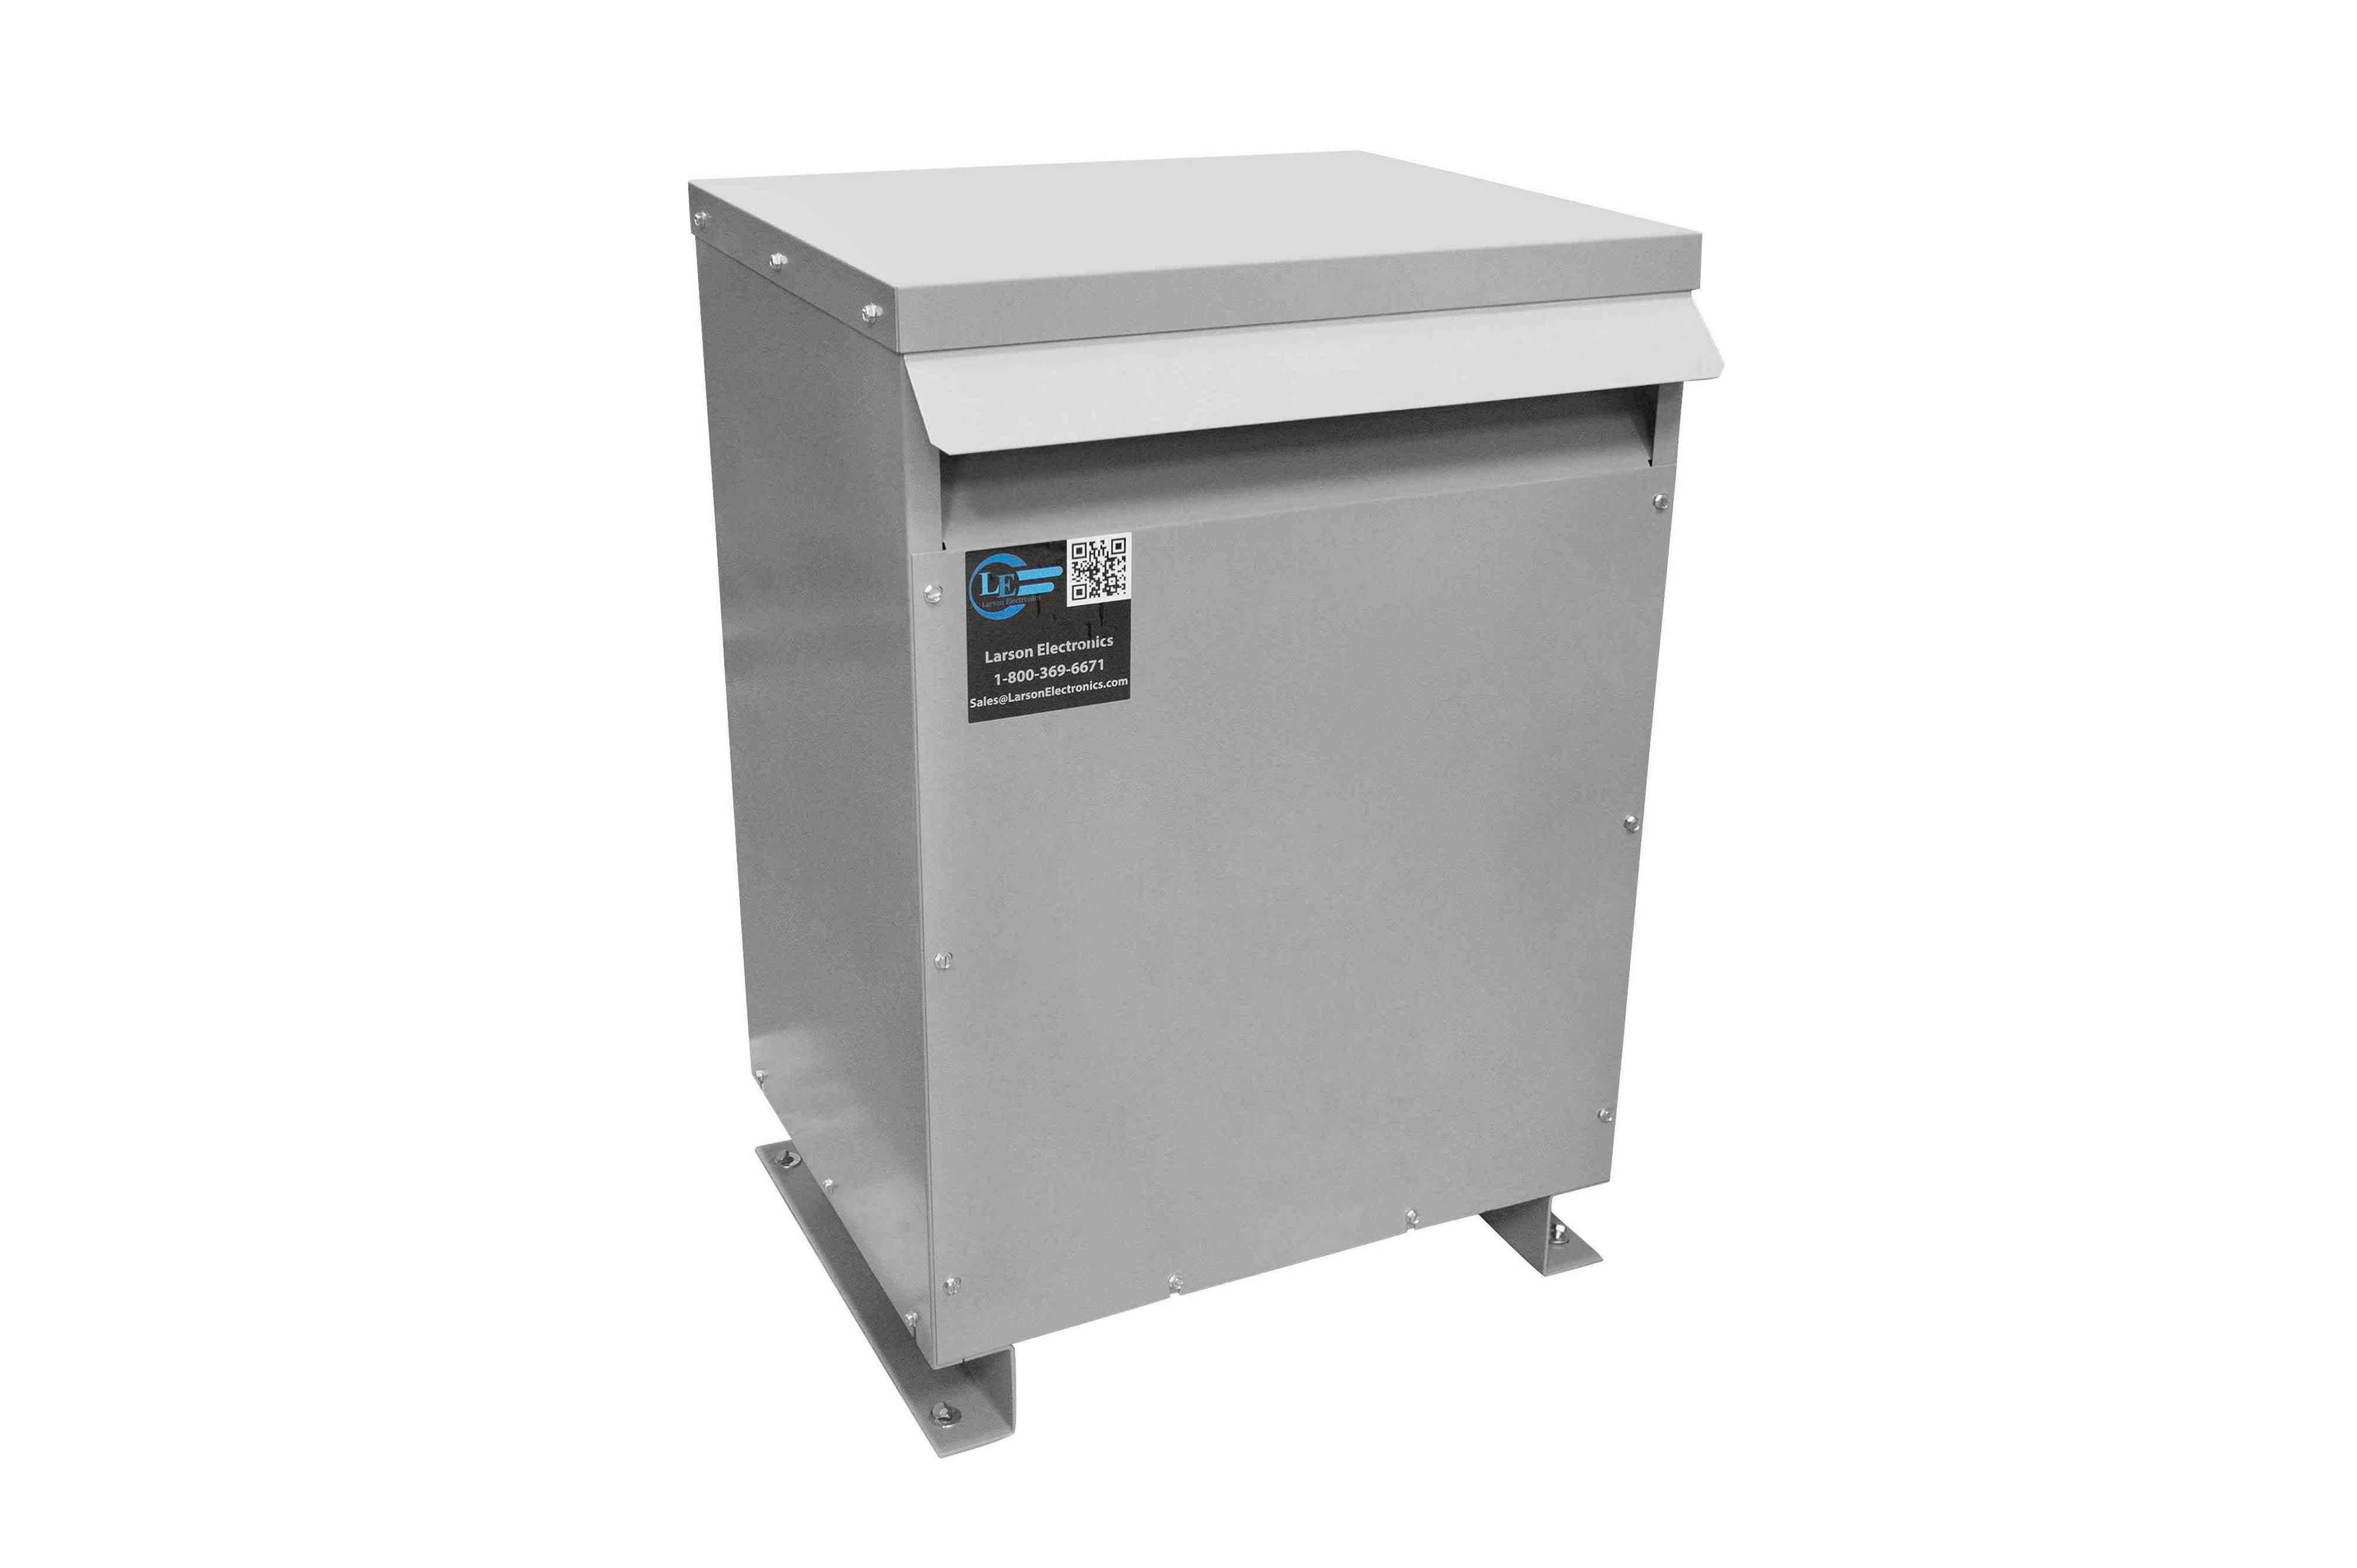 80 kVA 3PH DOE Transformer, 460V Delta Primary, 208Y/120 Wye-N Secondary, N3R, Ventilated, 60 Hz